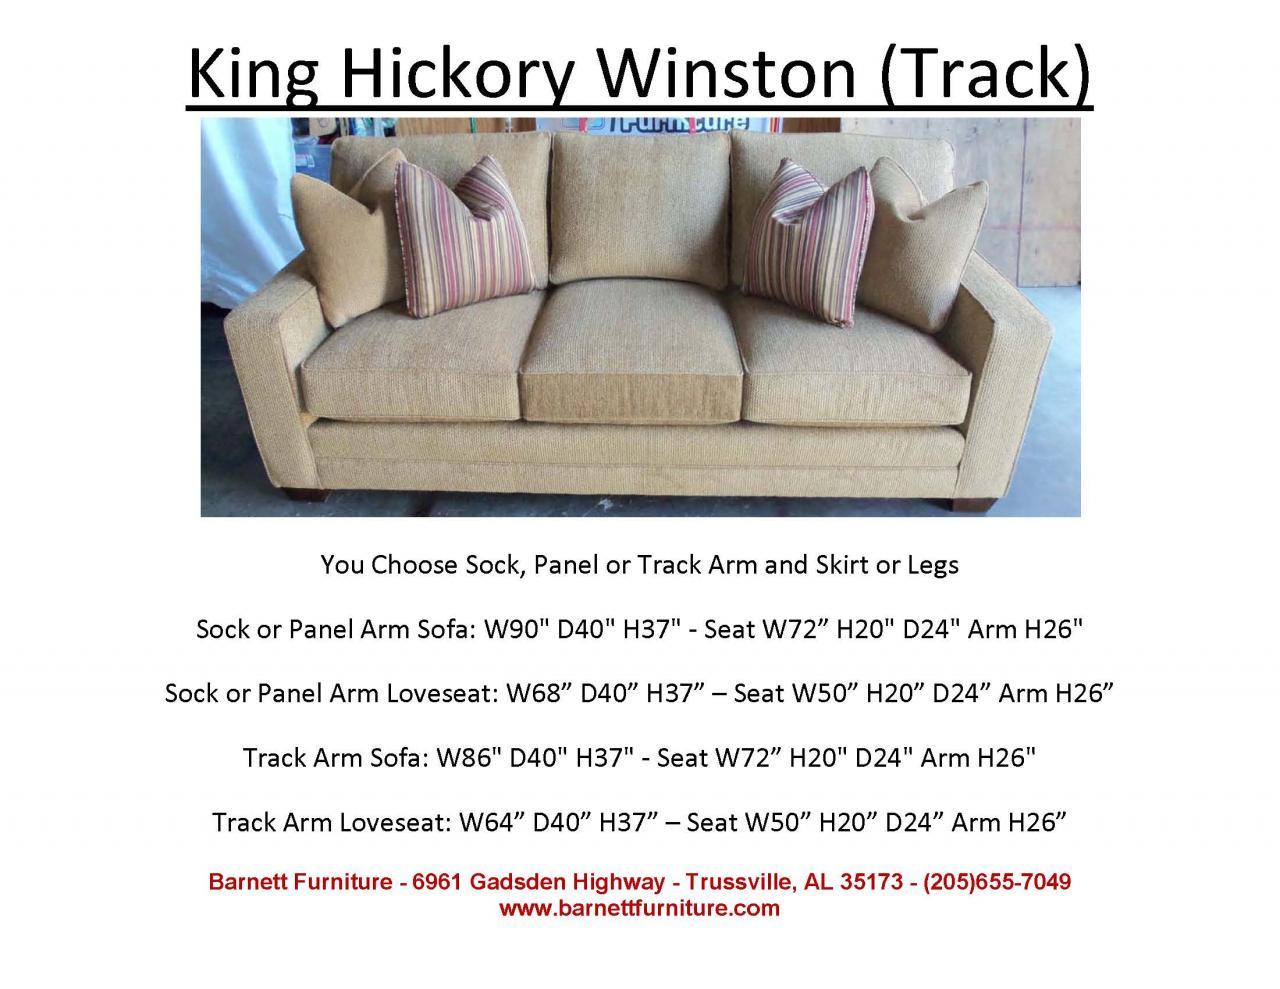 King Hickory Winston Sofa With Track Arm